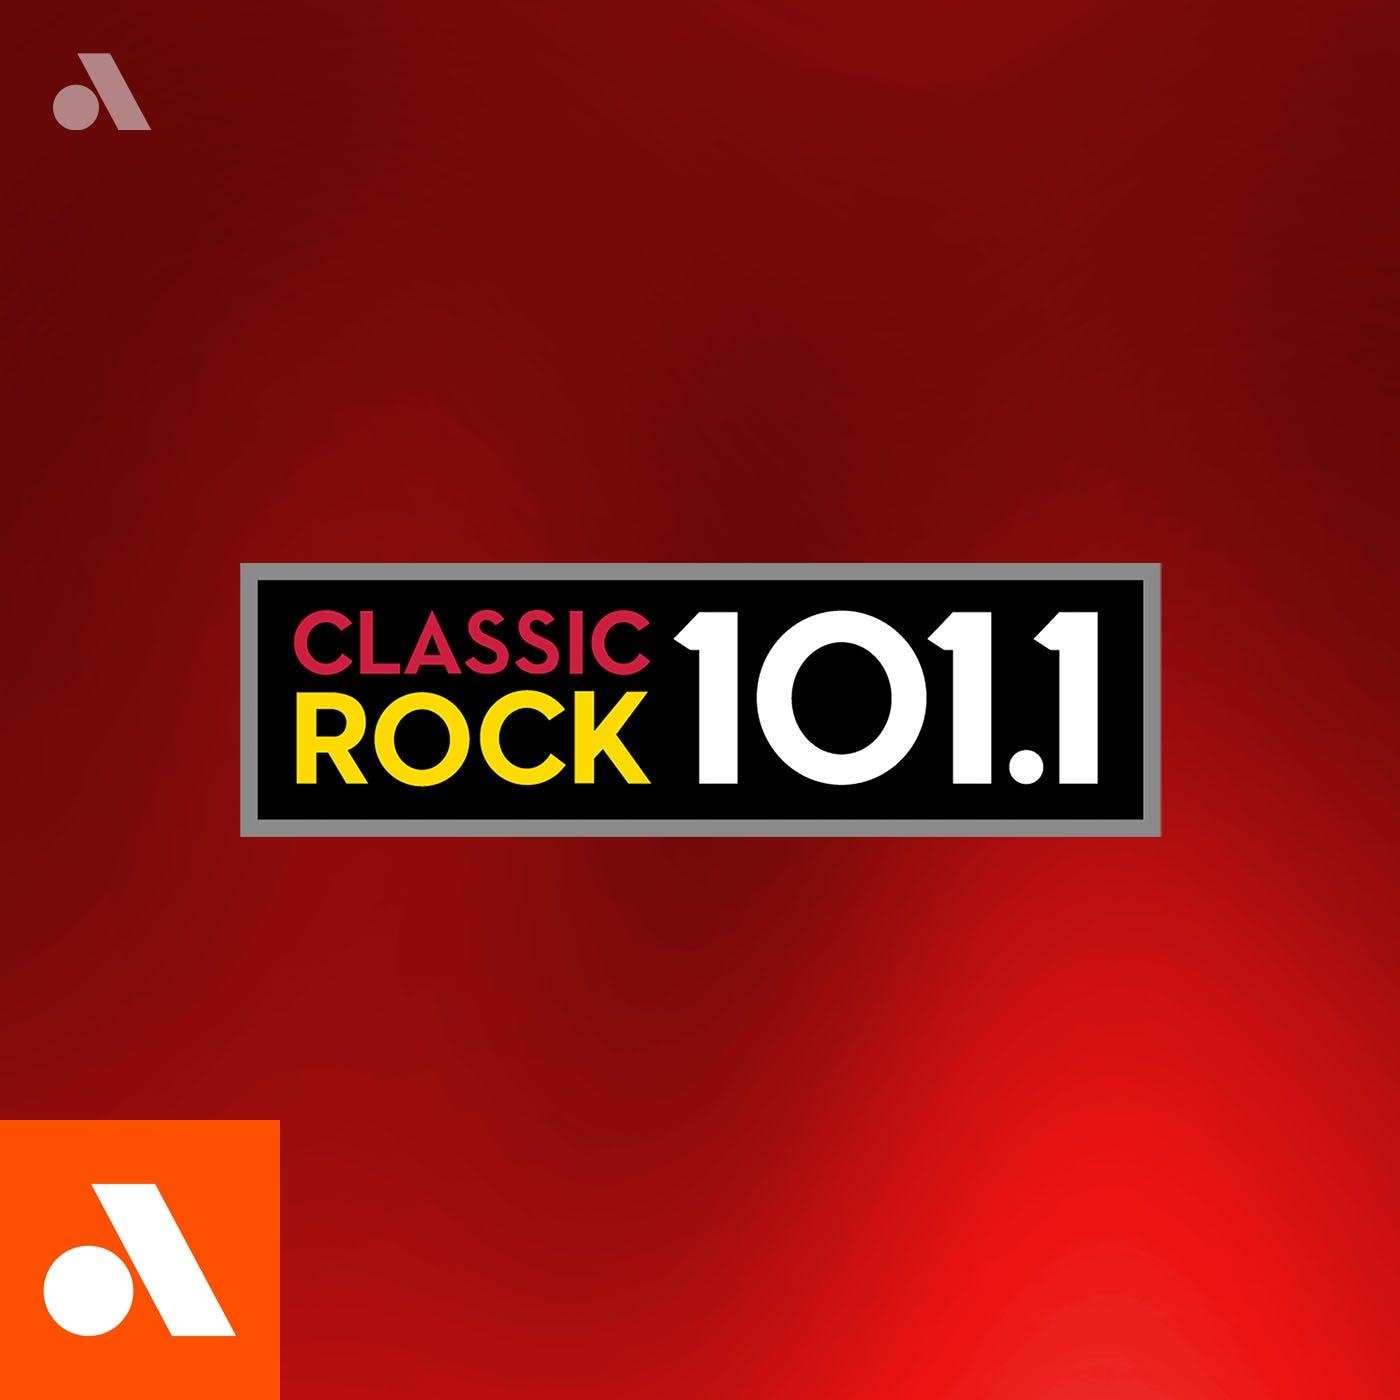 Classic Rock 101.1